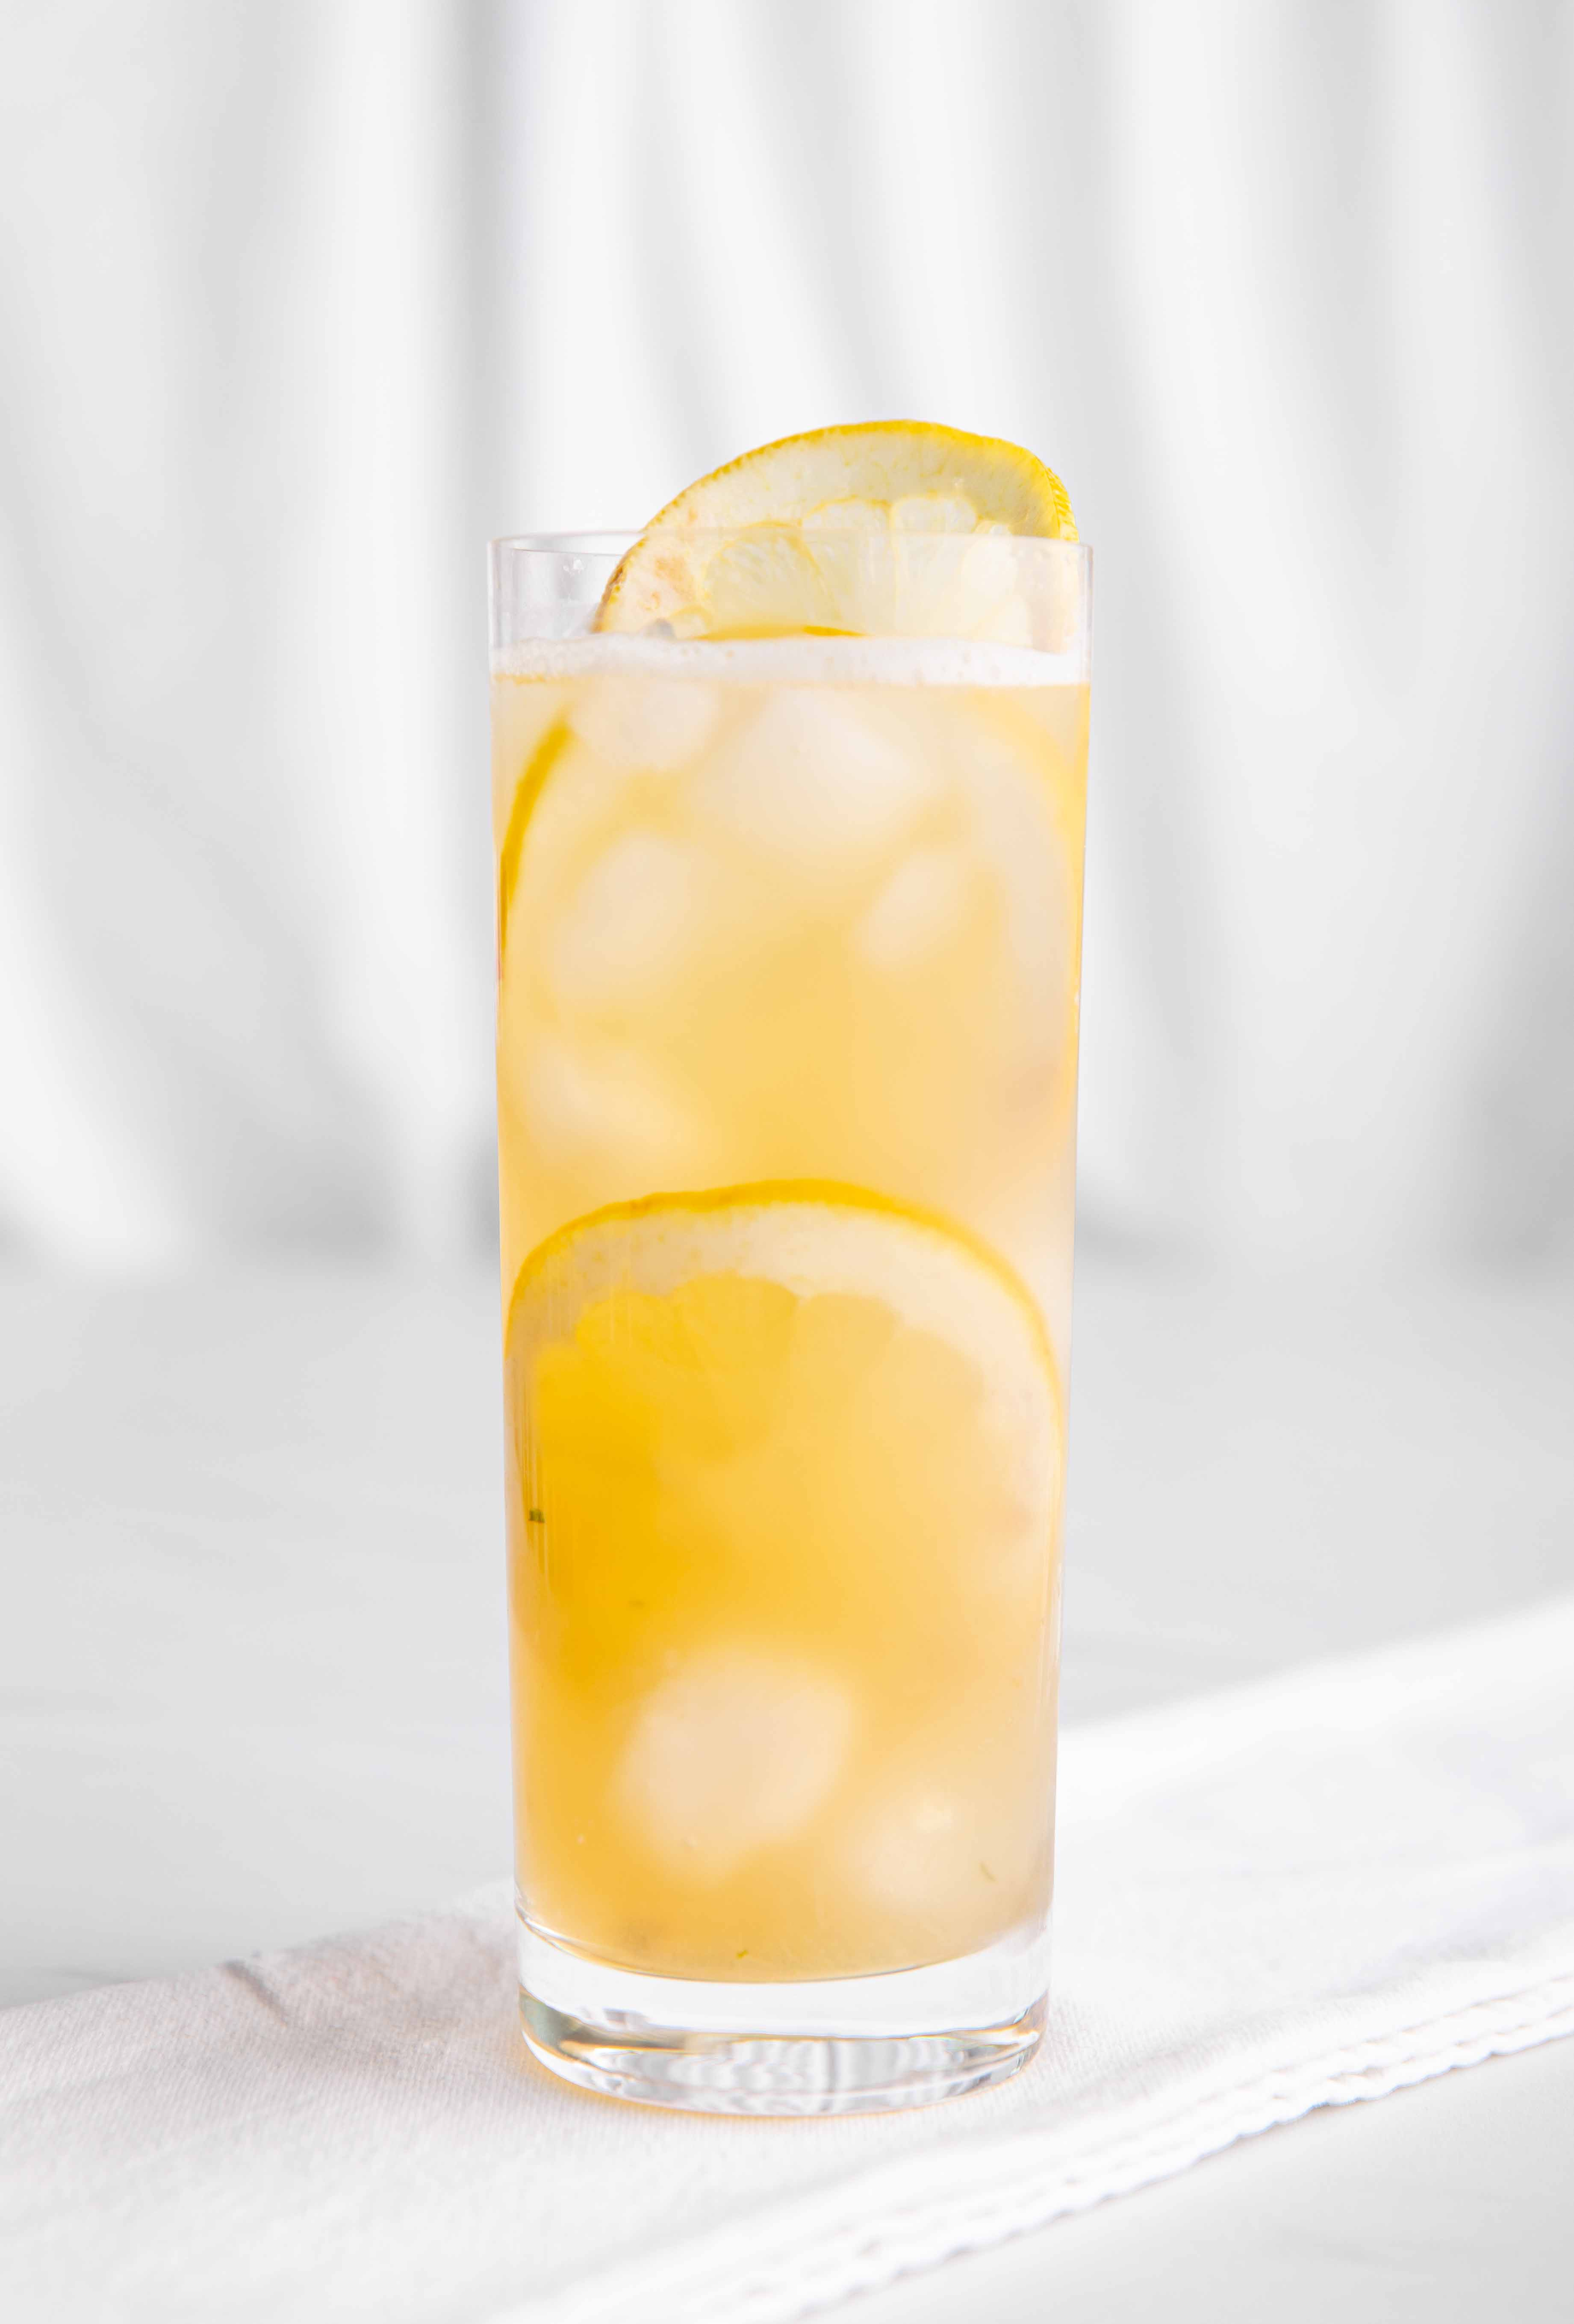 Morning Breakfast Lemonade – Earl Grey Lemonade